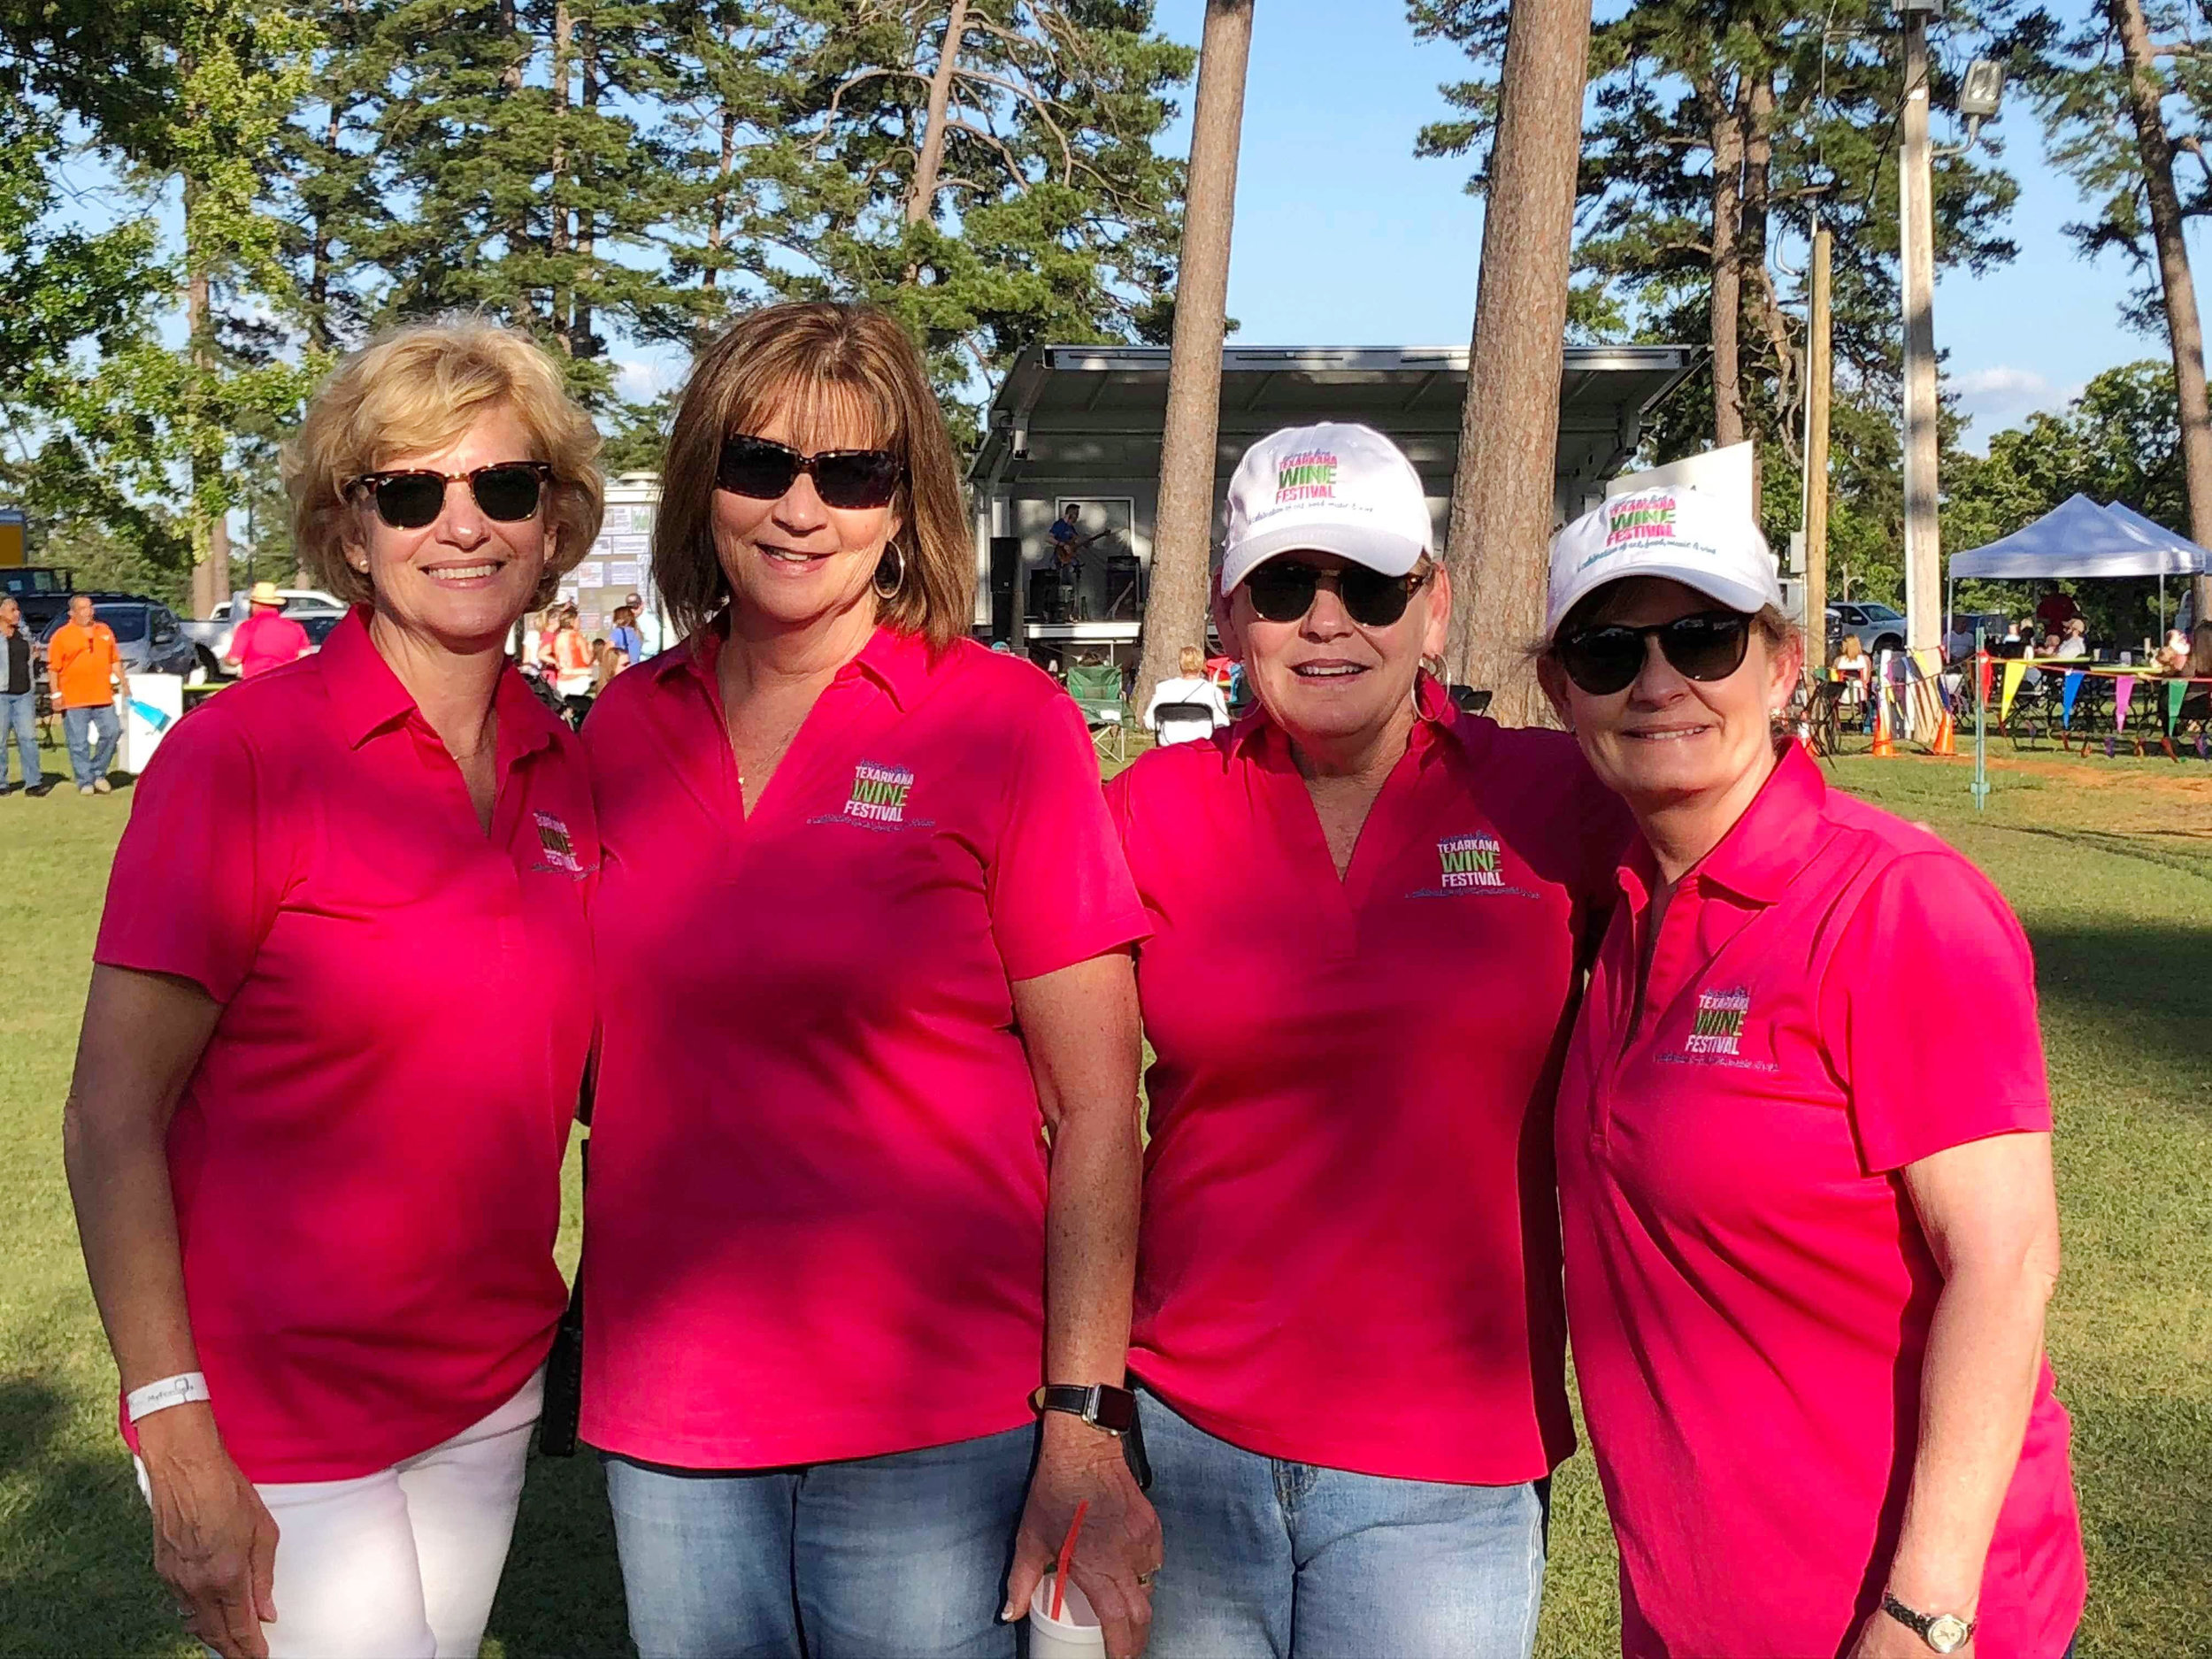 Cathy Van Herpen, Andrea Washington, Terrie Arnold and Brenda Sutton